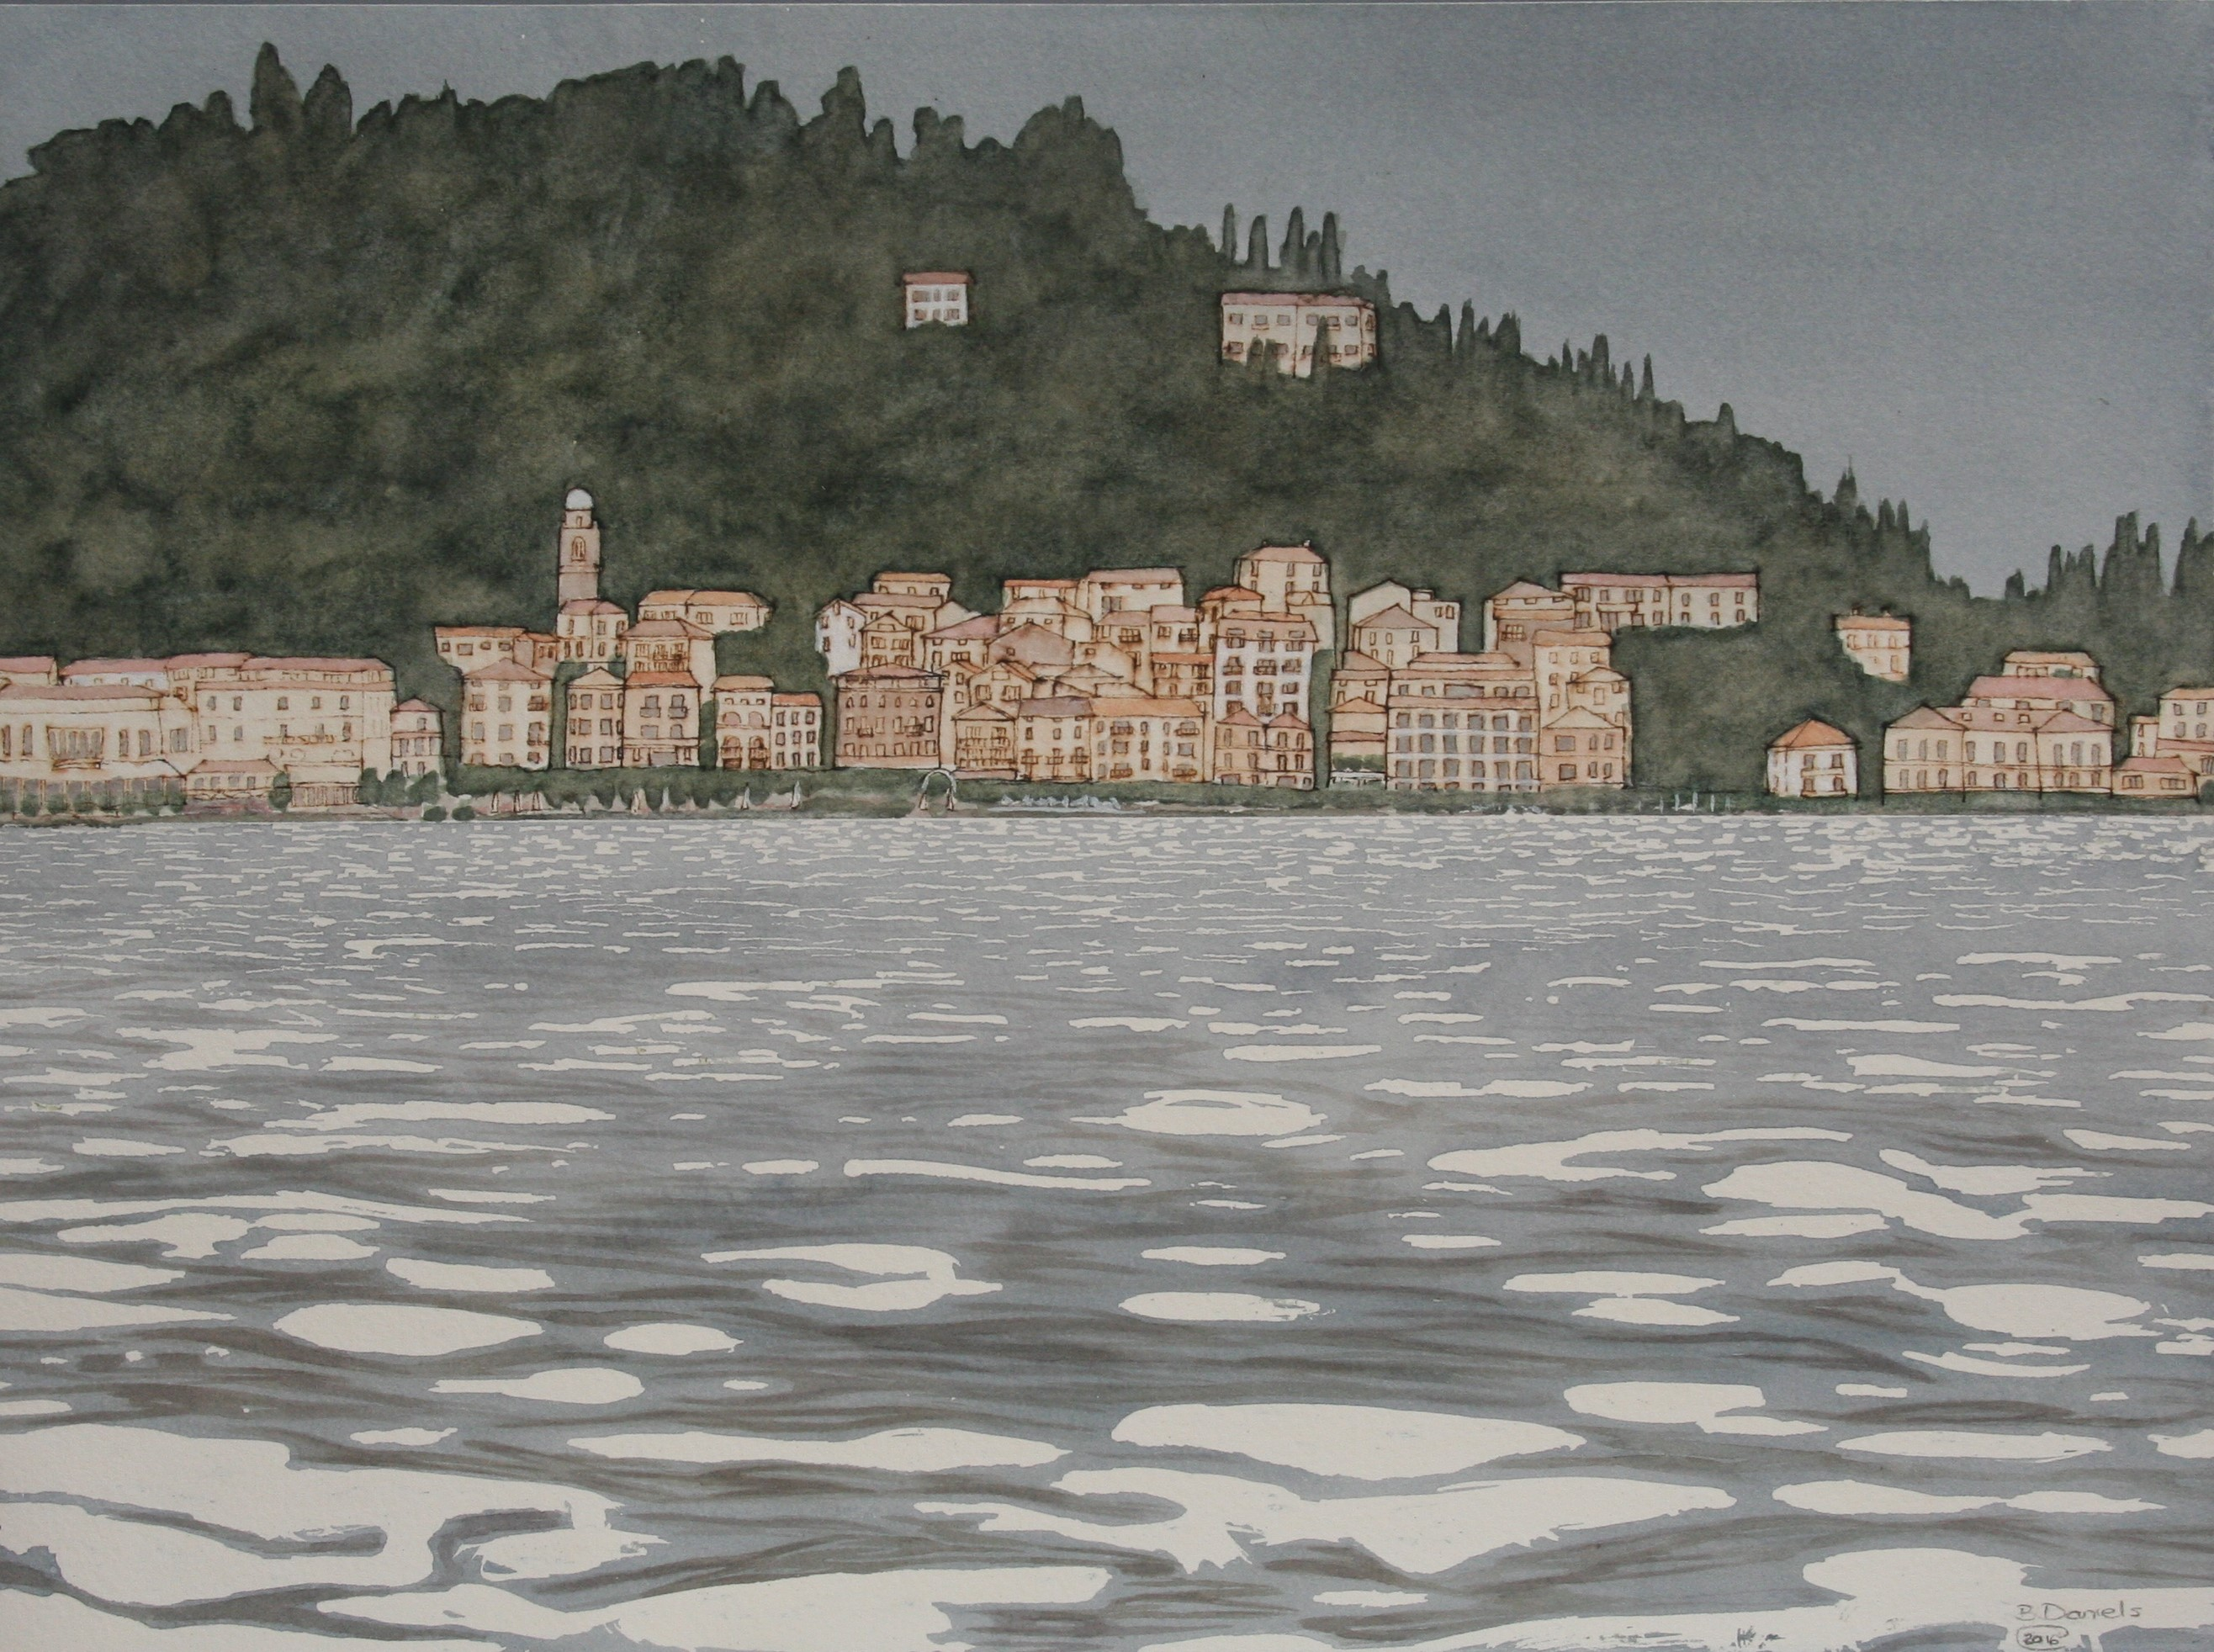 Lake Como 2, view of Bellagio